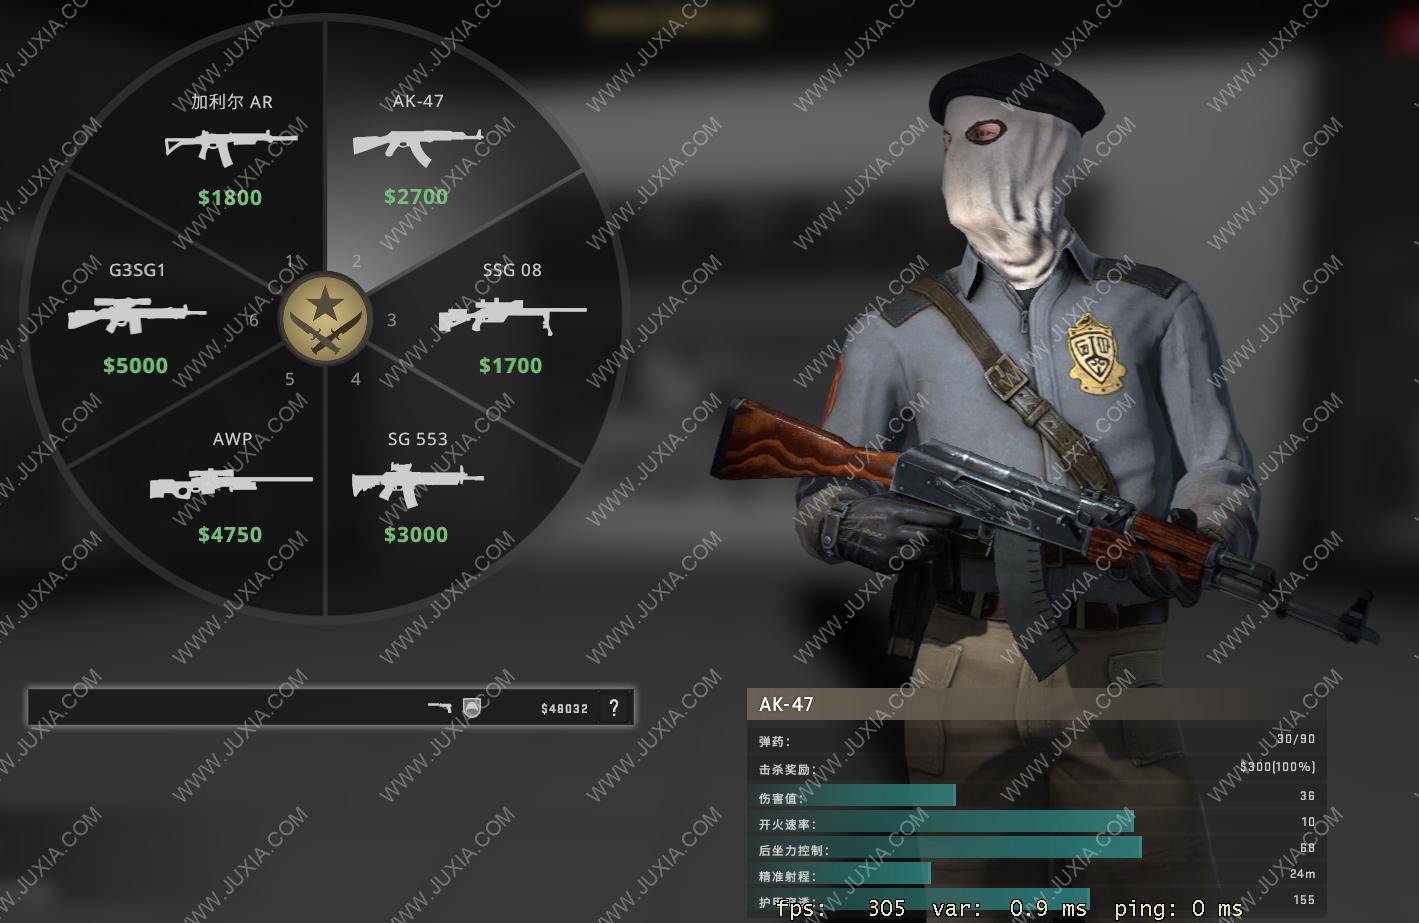 CSGO中AK47压枪技巧详解 AK怎么压枪打的准